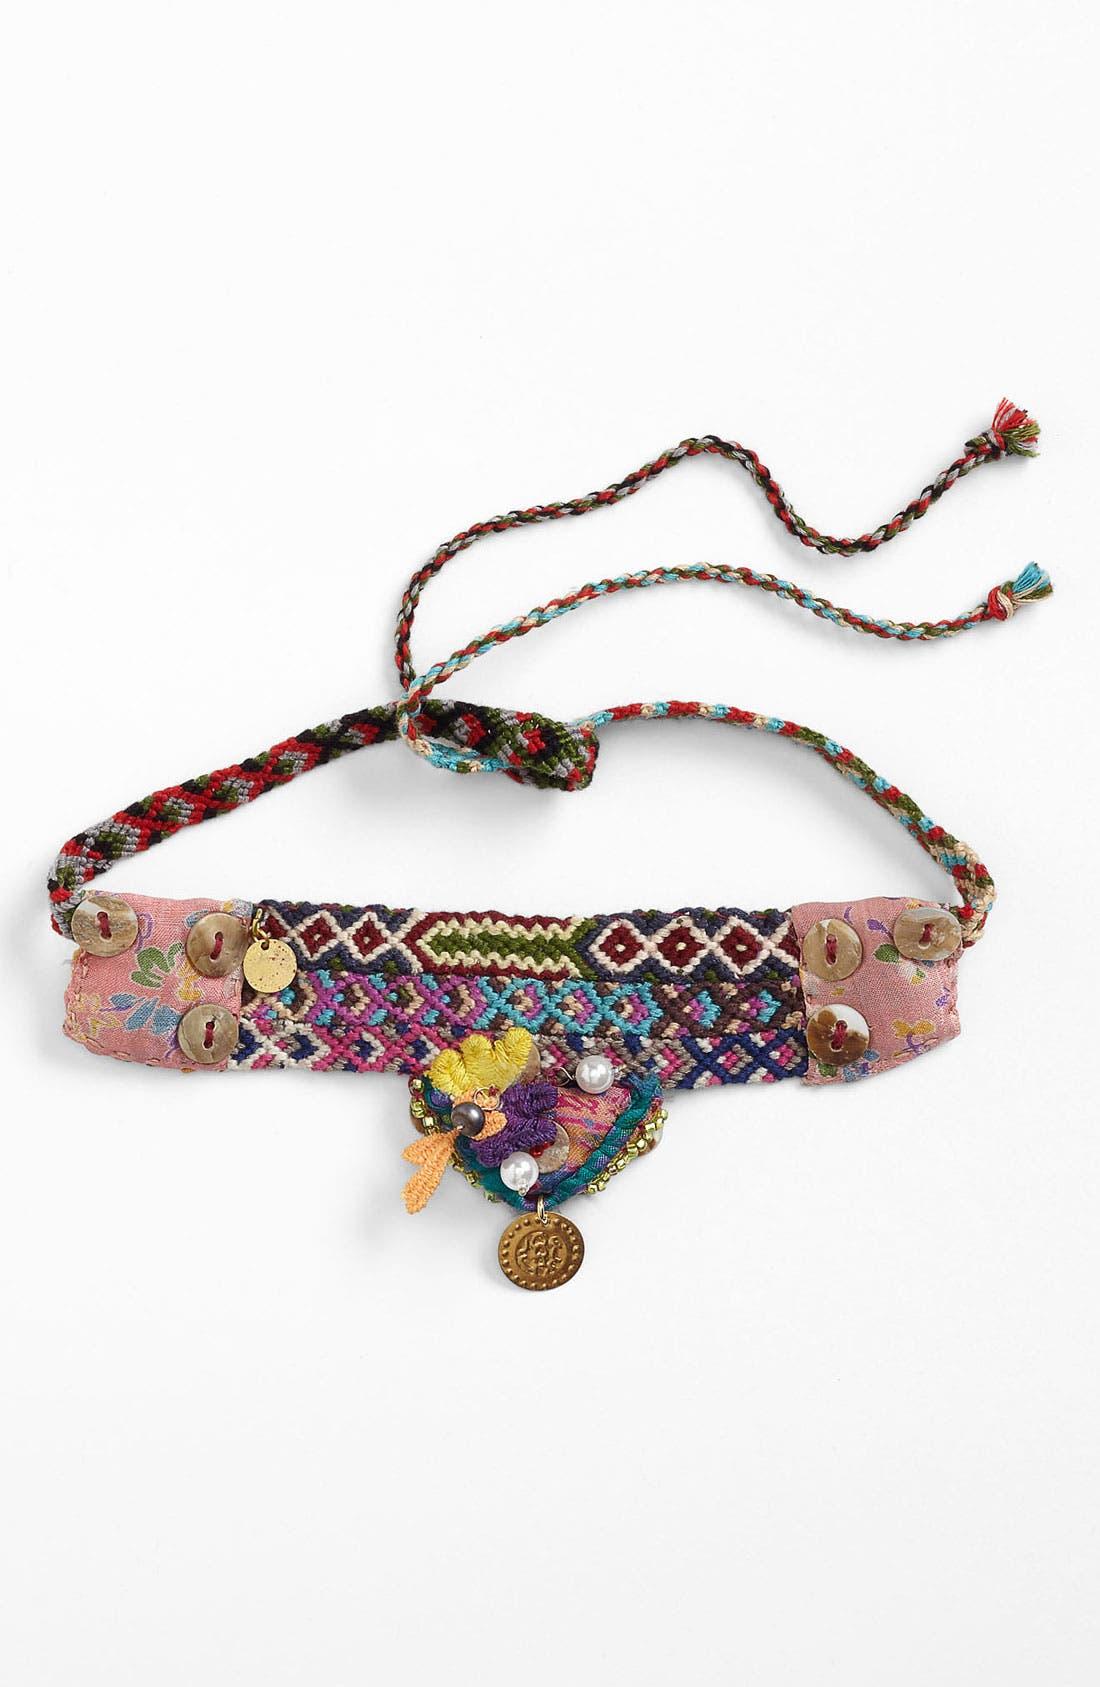 Main Image - Chan Luu Friendship Bracelet